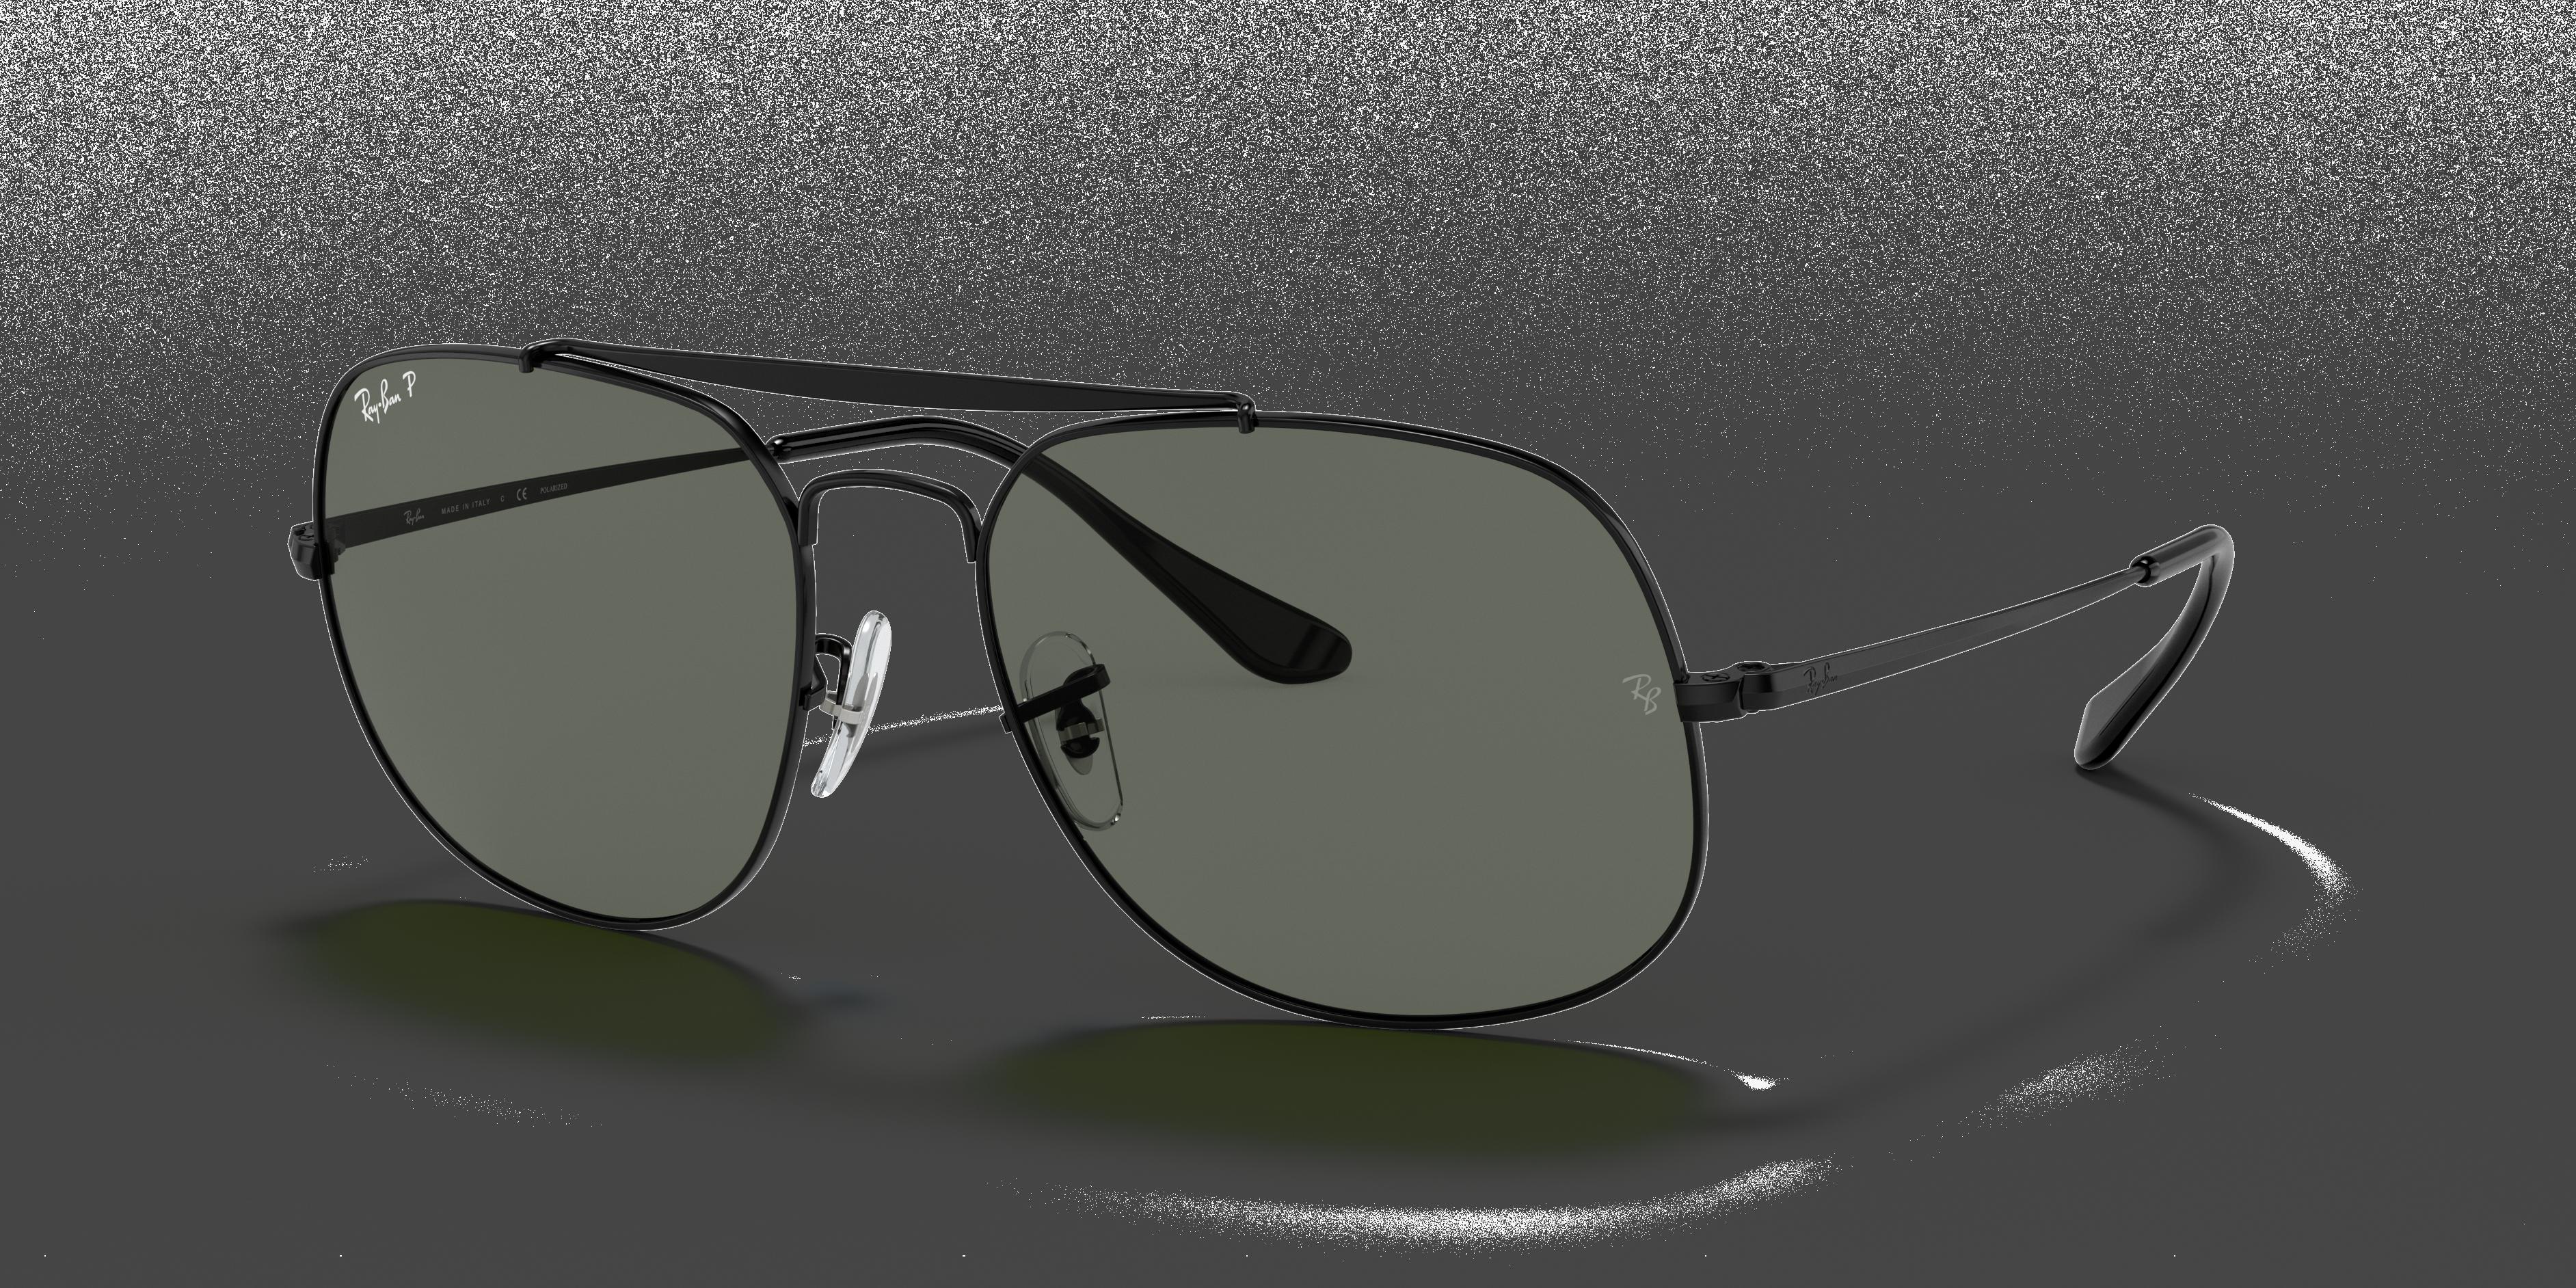 Ray-Ban General Black, Polarized Green Lenses - RB3561